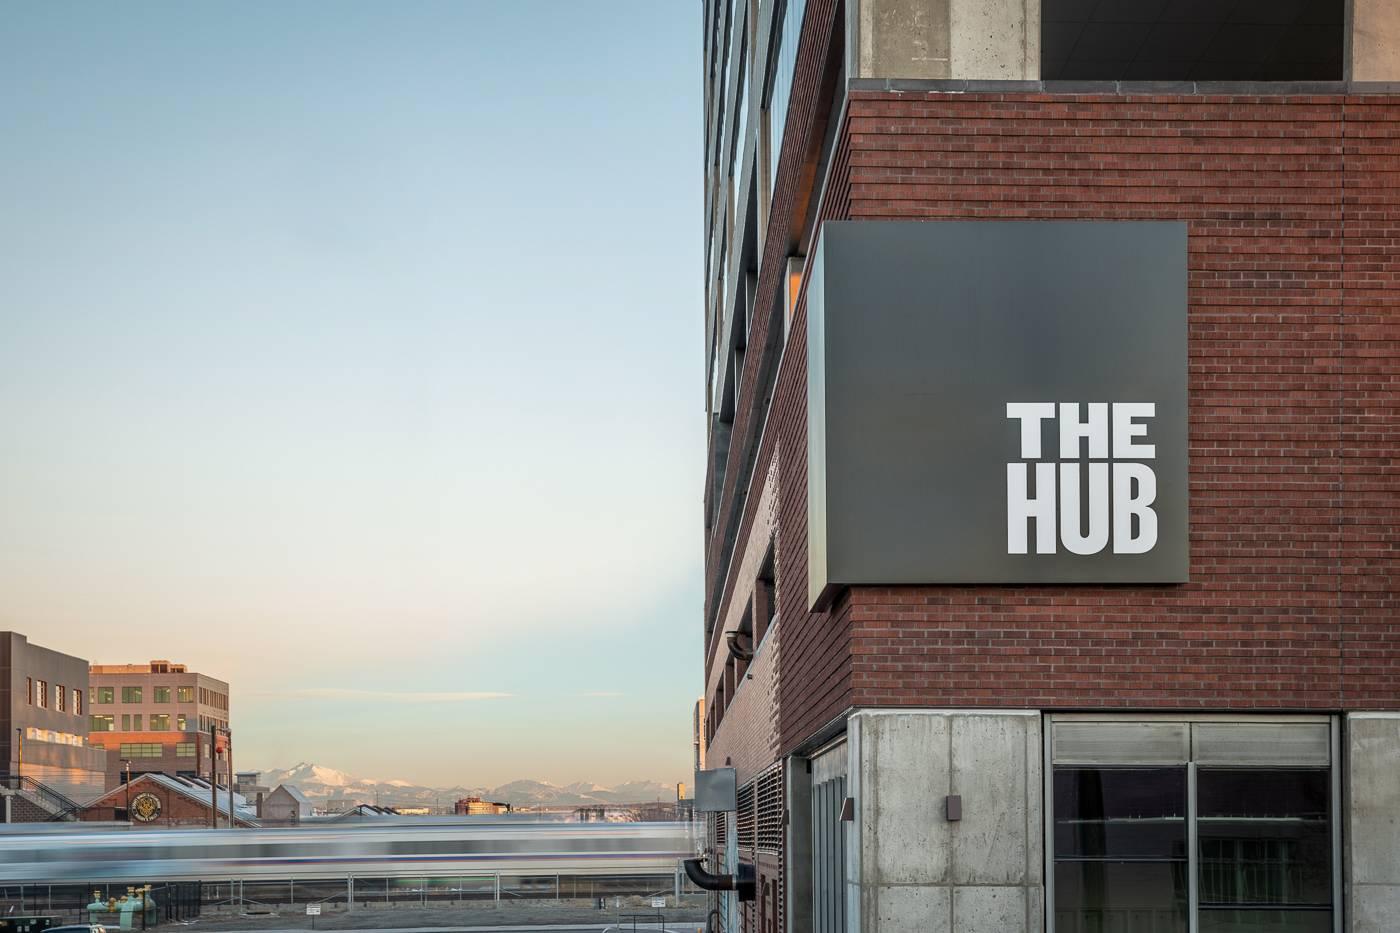 20190317_The_HUB_At_RiNo_0003.jpg